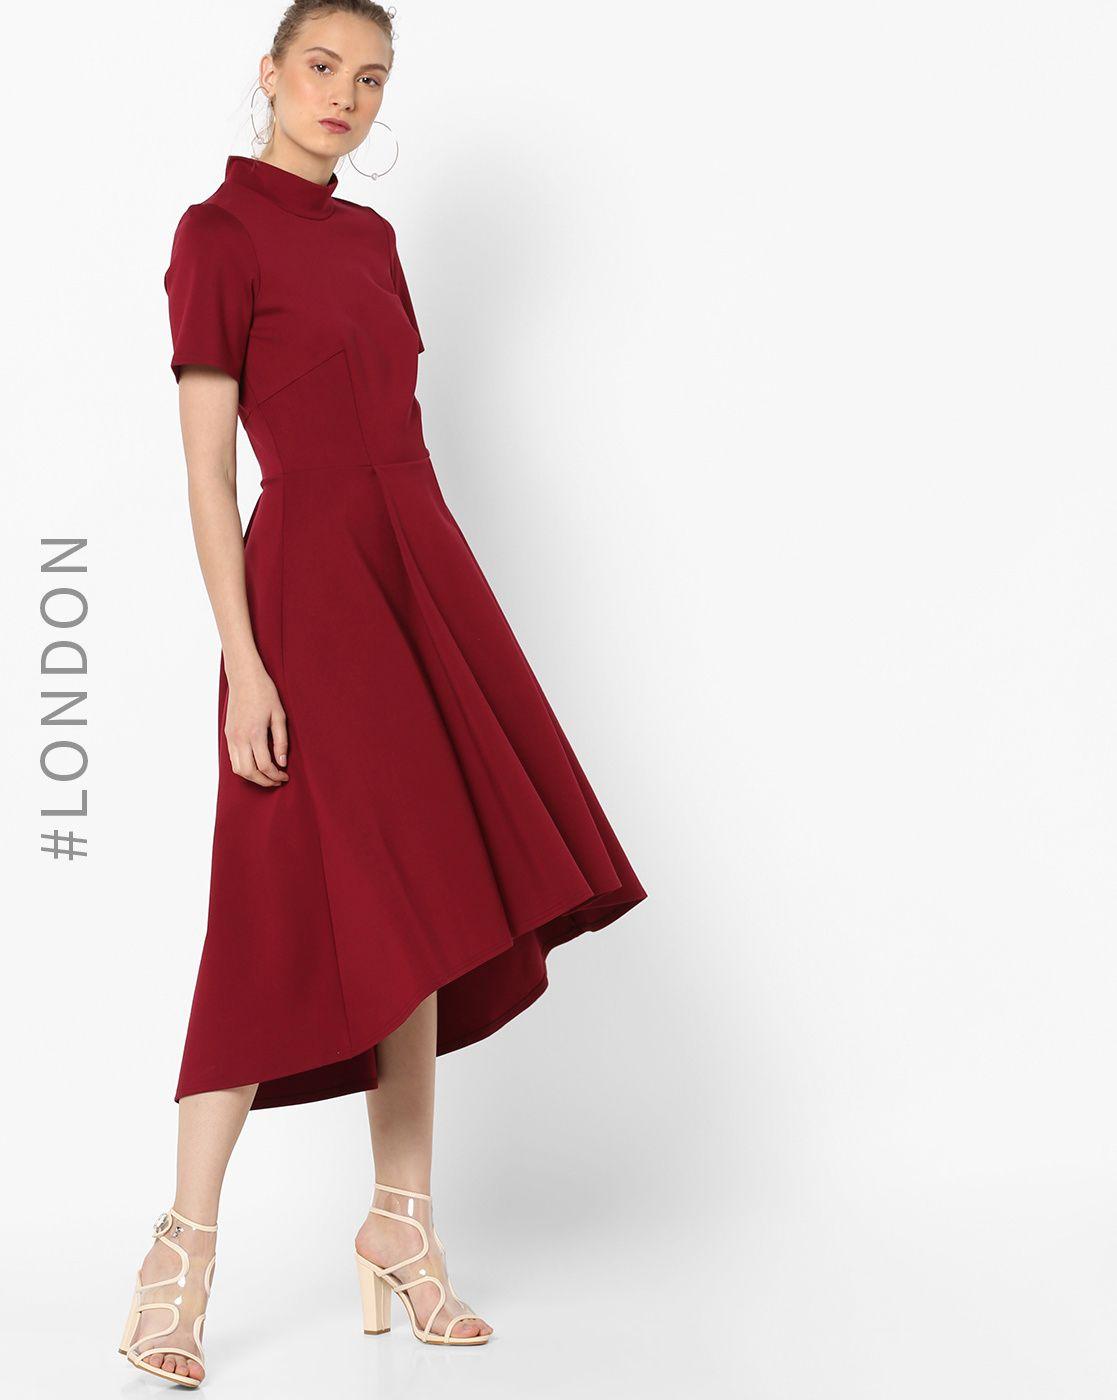 e1dae64e59066 Buy Closet London Women Oxblood High-Neck A-line Midi Dress